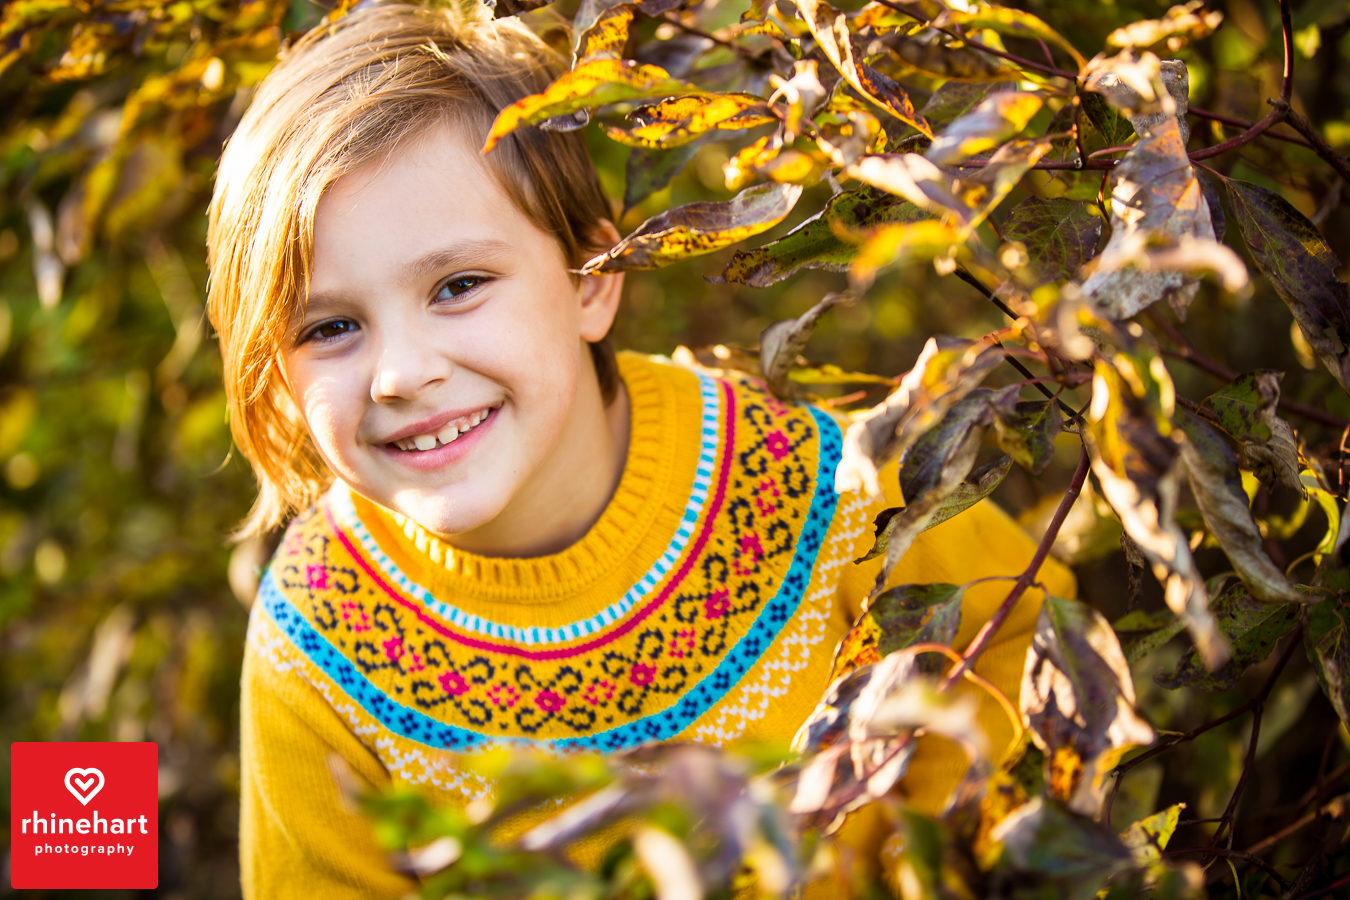 central-pa-pennsylvania-family-portrait-photographers-creative-unique-vibrant-colorful-15